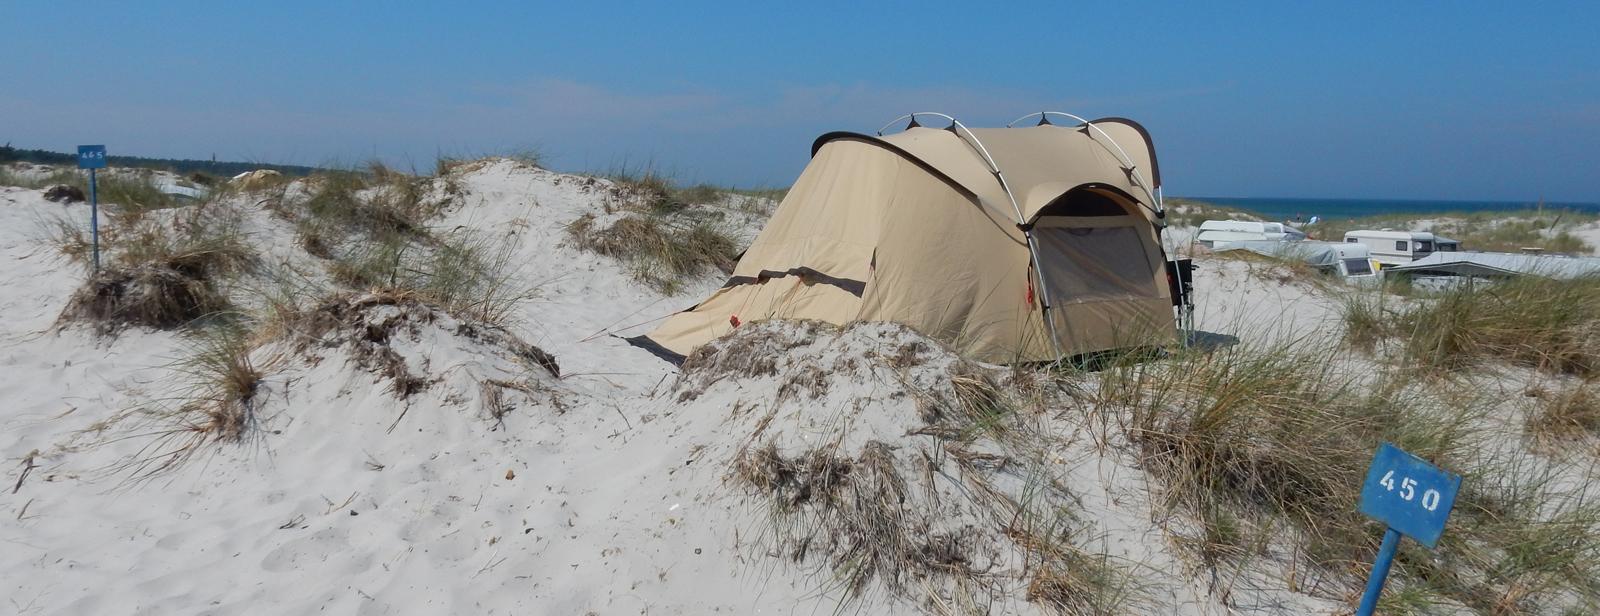 Prerow - Dünenromantik an der Ostseeküste